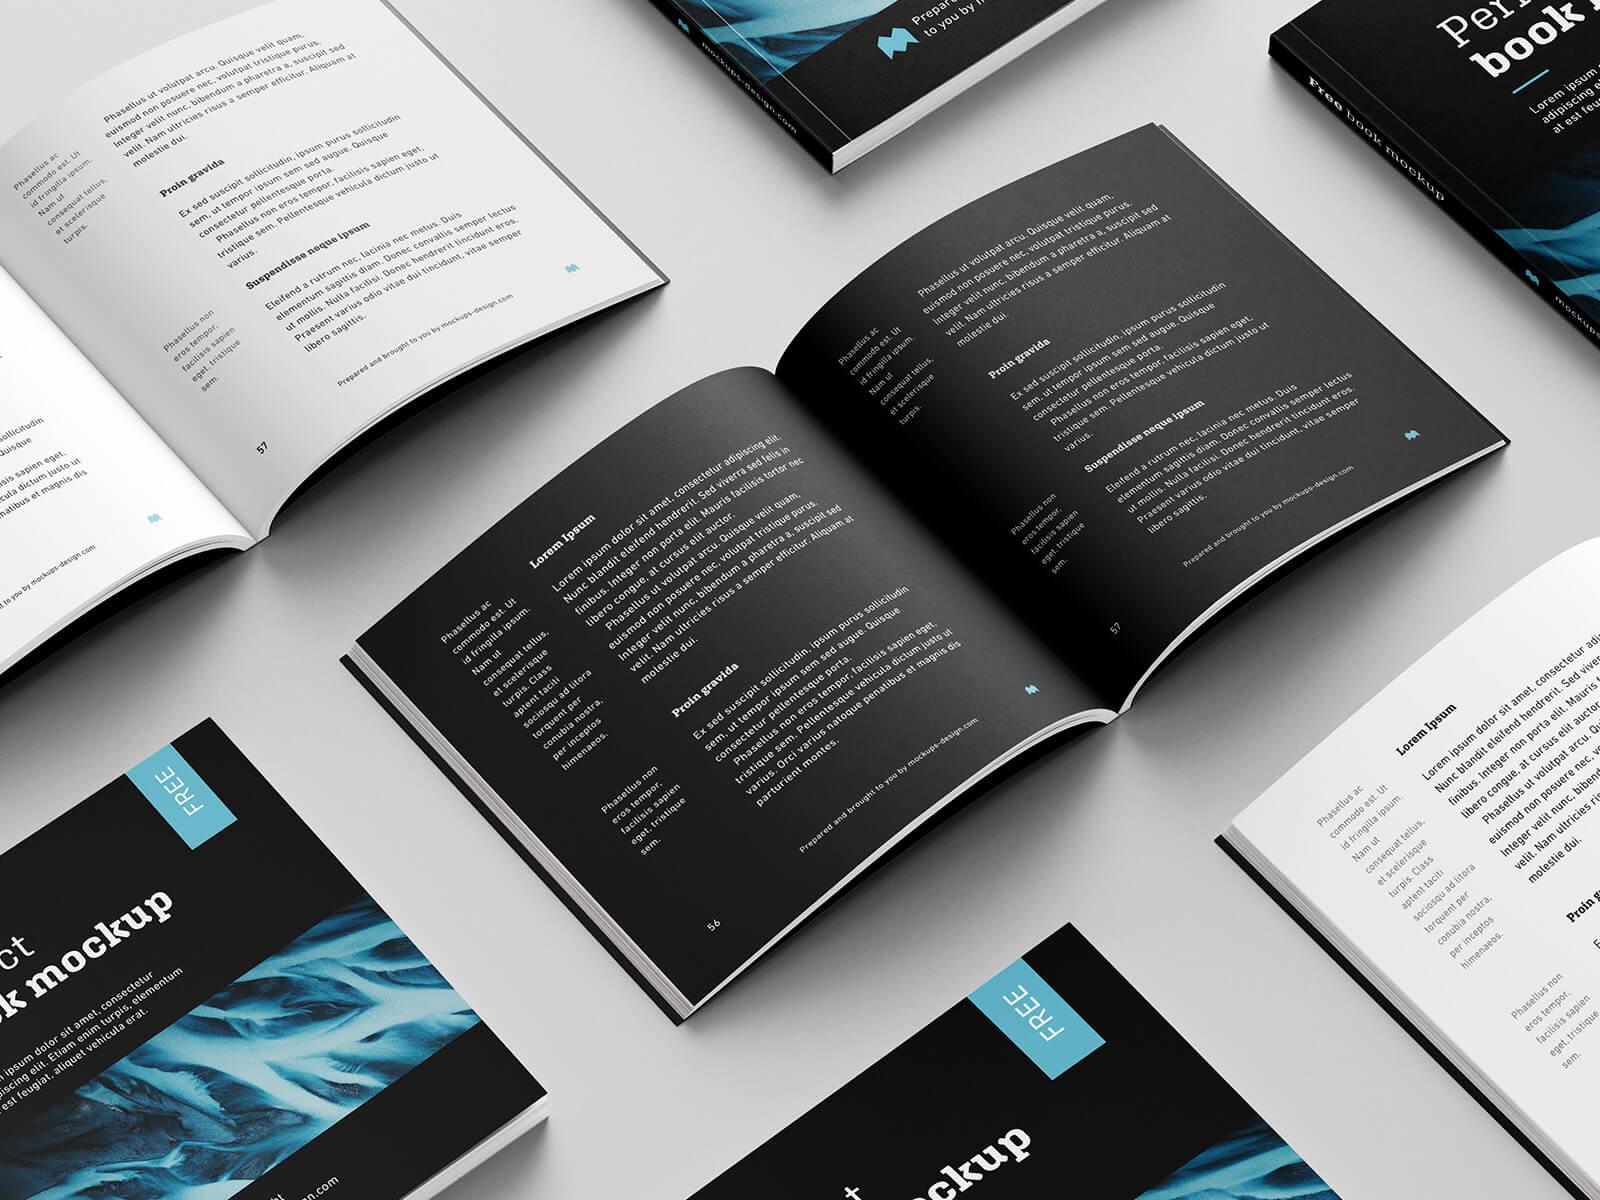 Free Black Square Book Mockup PSD Template3 (1)